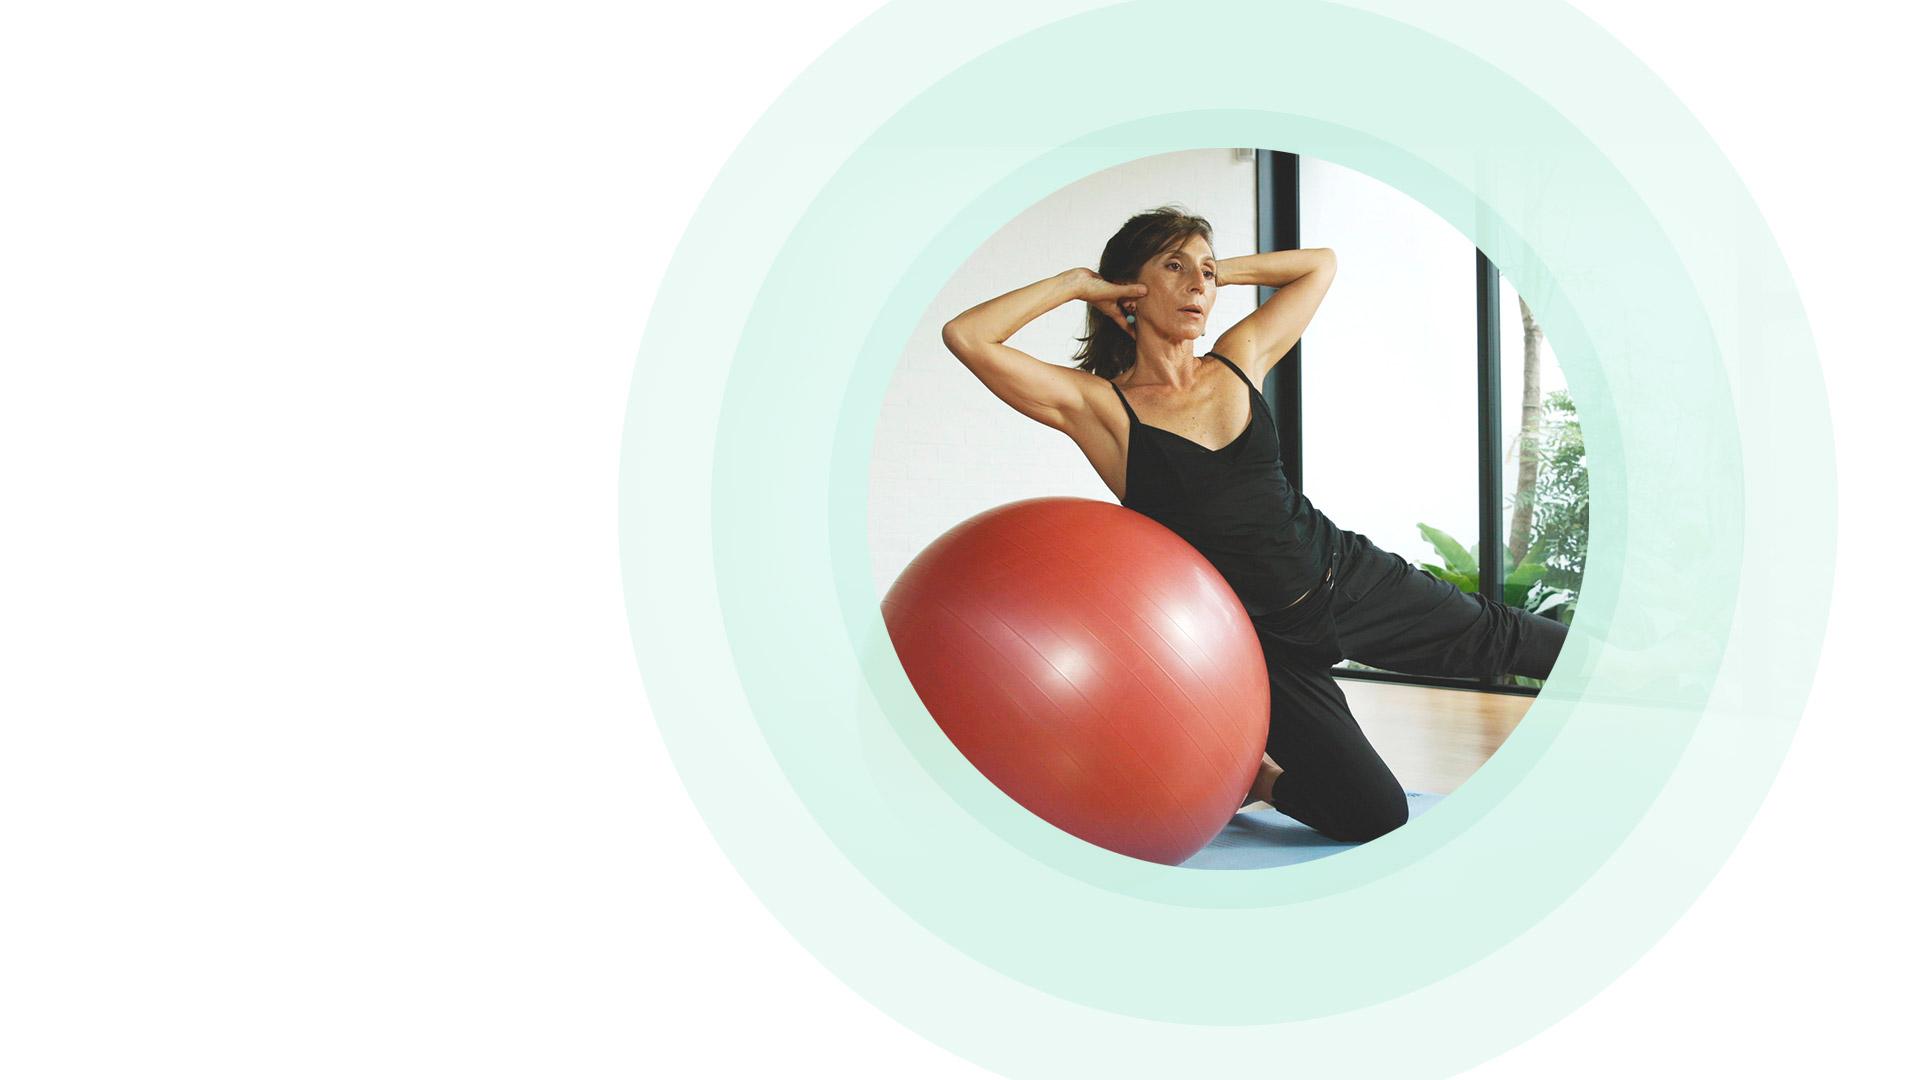 Pilates Terapêutico: Alongamento, fortalecimento e postura